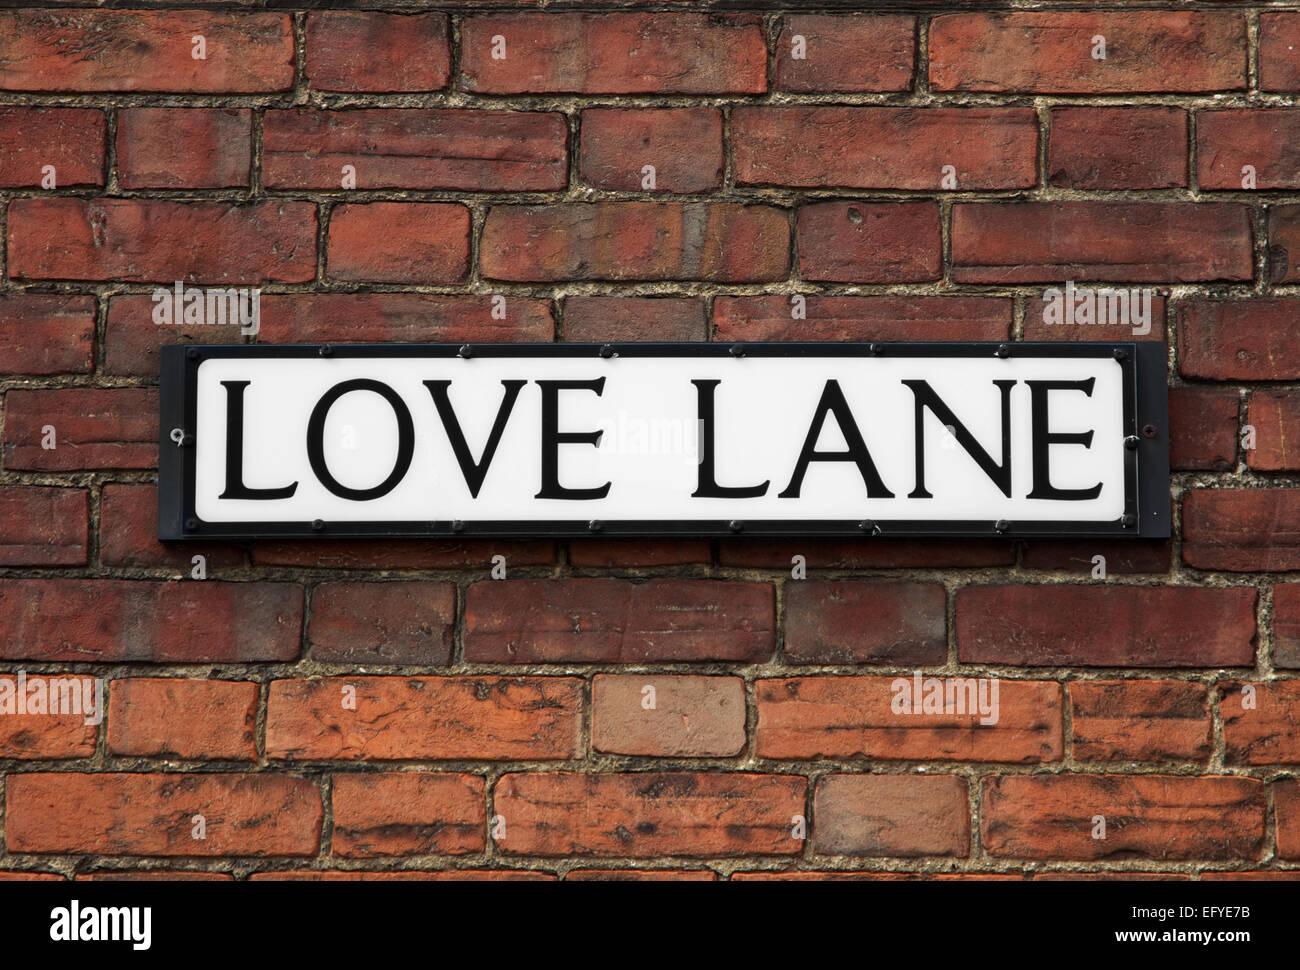 Romantic street sign - Stock Image